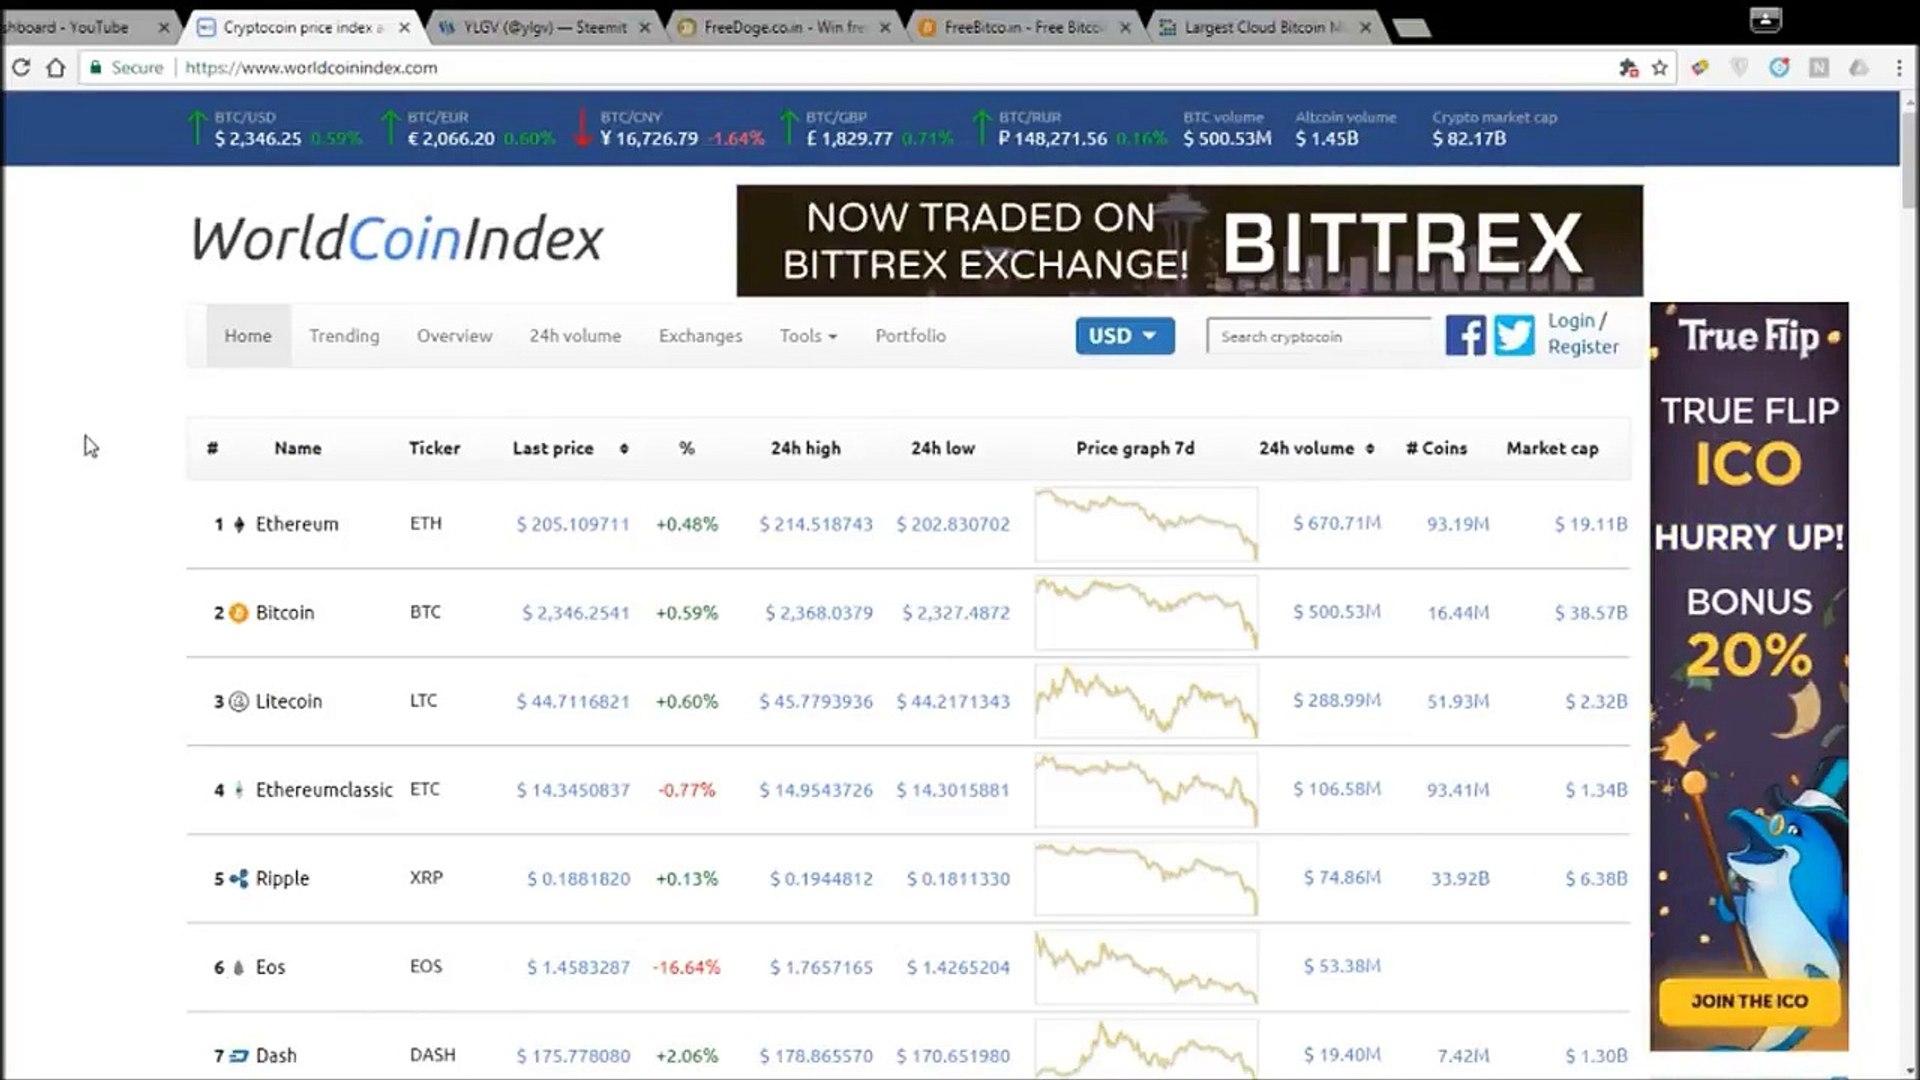 Ethereum, Litecoin, and Ripple Crashing Hard! Crypto Bear Market?